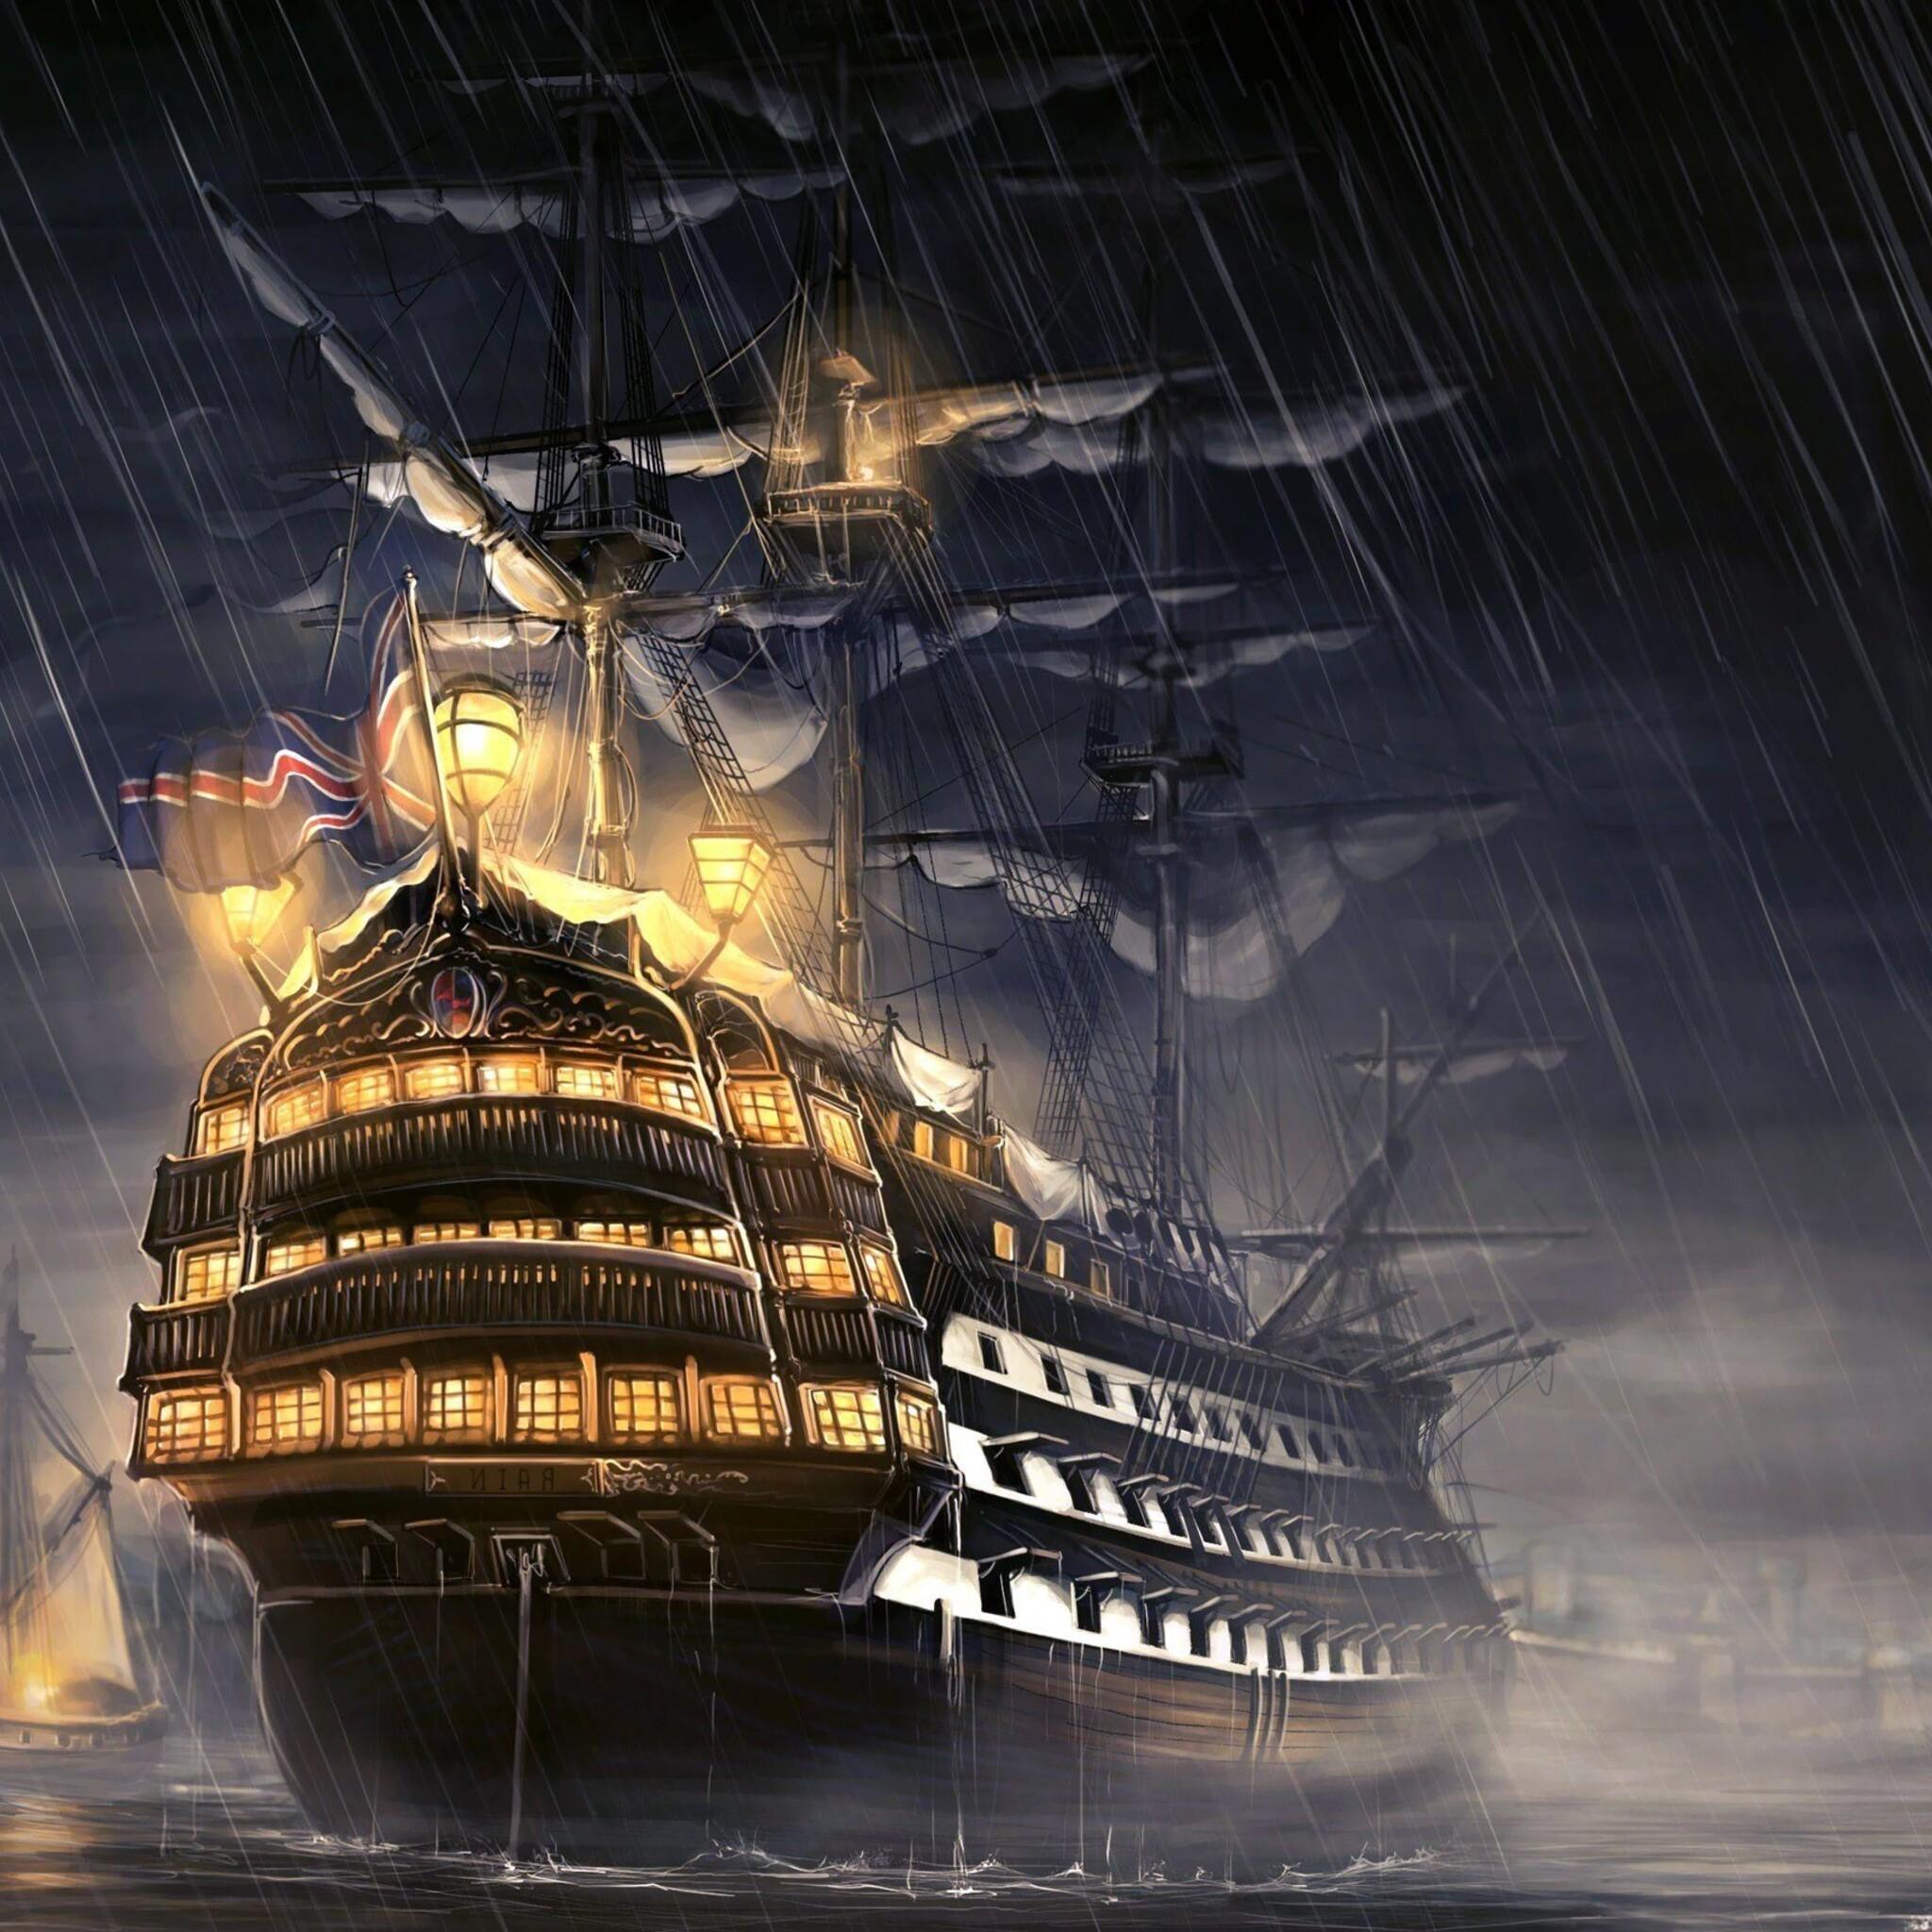 Pirates Of The Caribbean Wallpaper Hd: 2048x2048 Pirates Of The Caribbean Ship Artwork Ipad Air